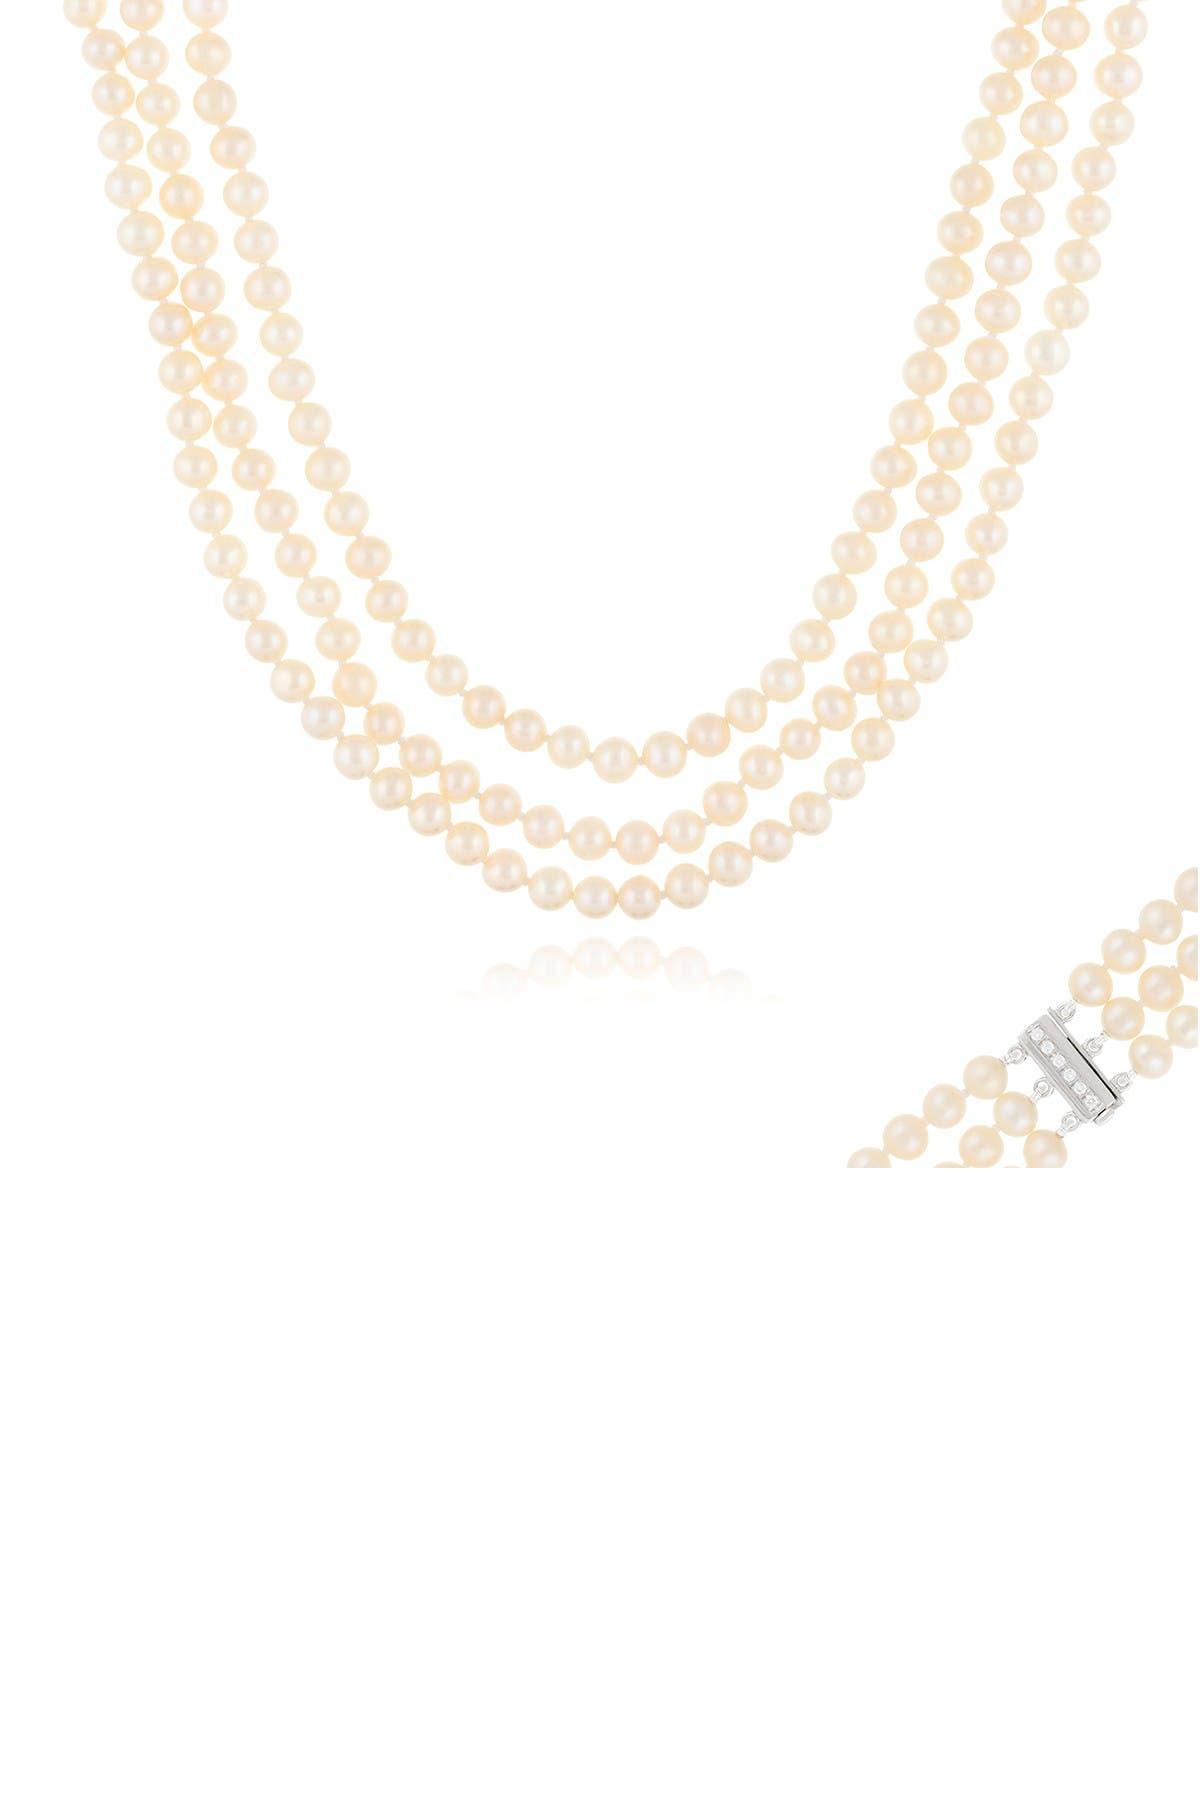 Image of Splendid Pearls 6-7mm Freshwater Pearl Triple Necklace